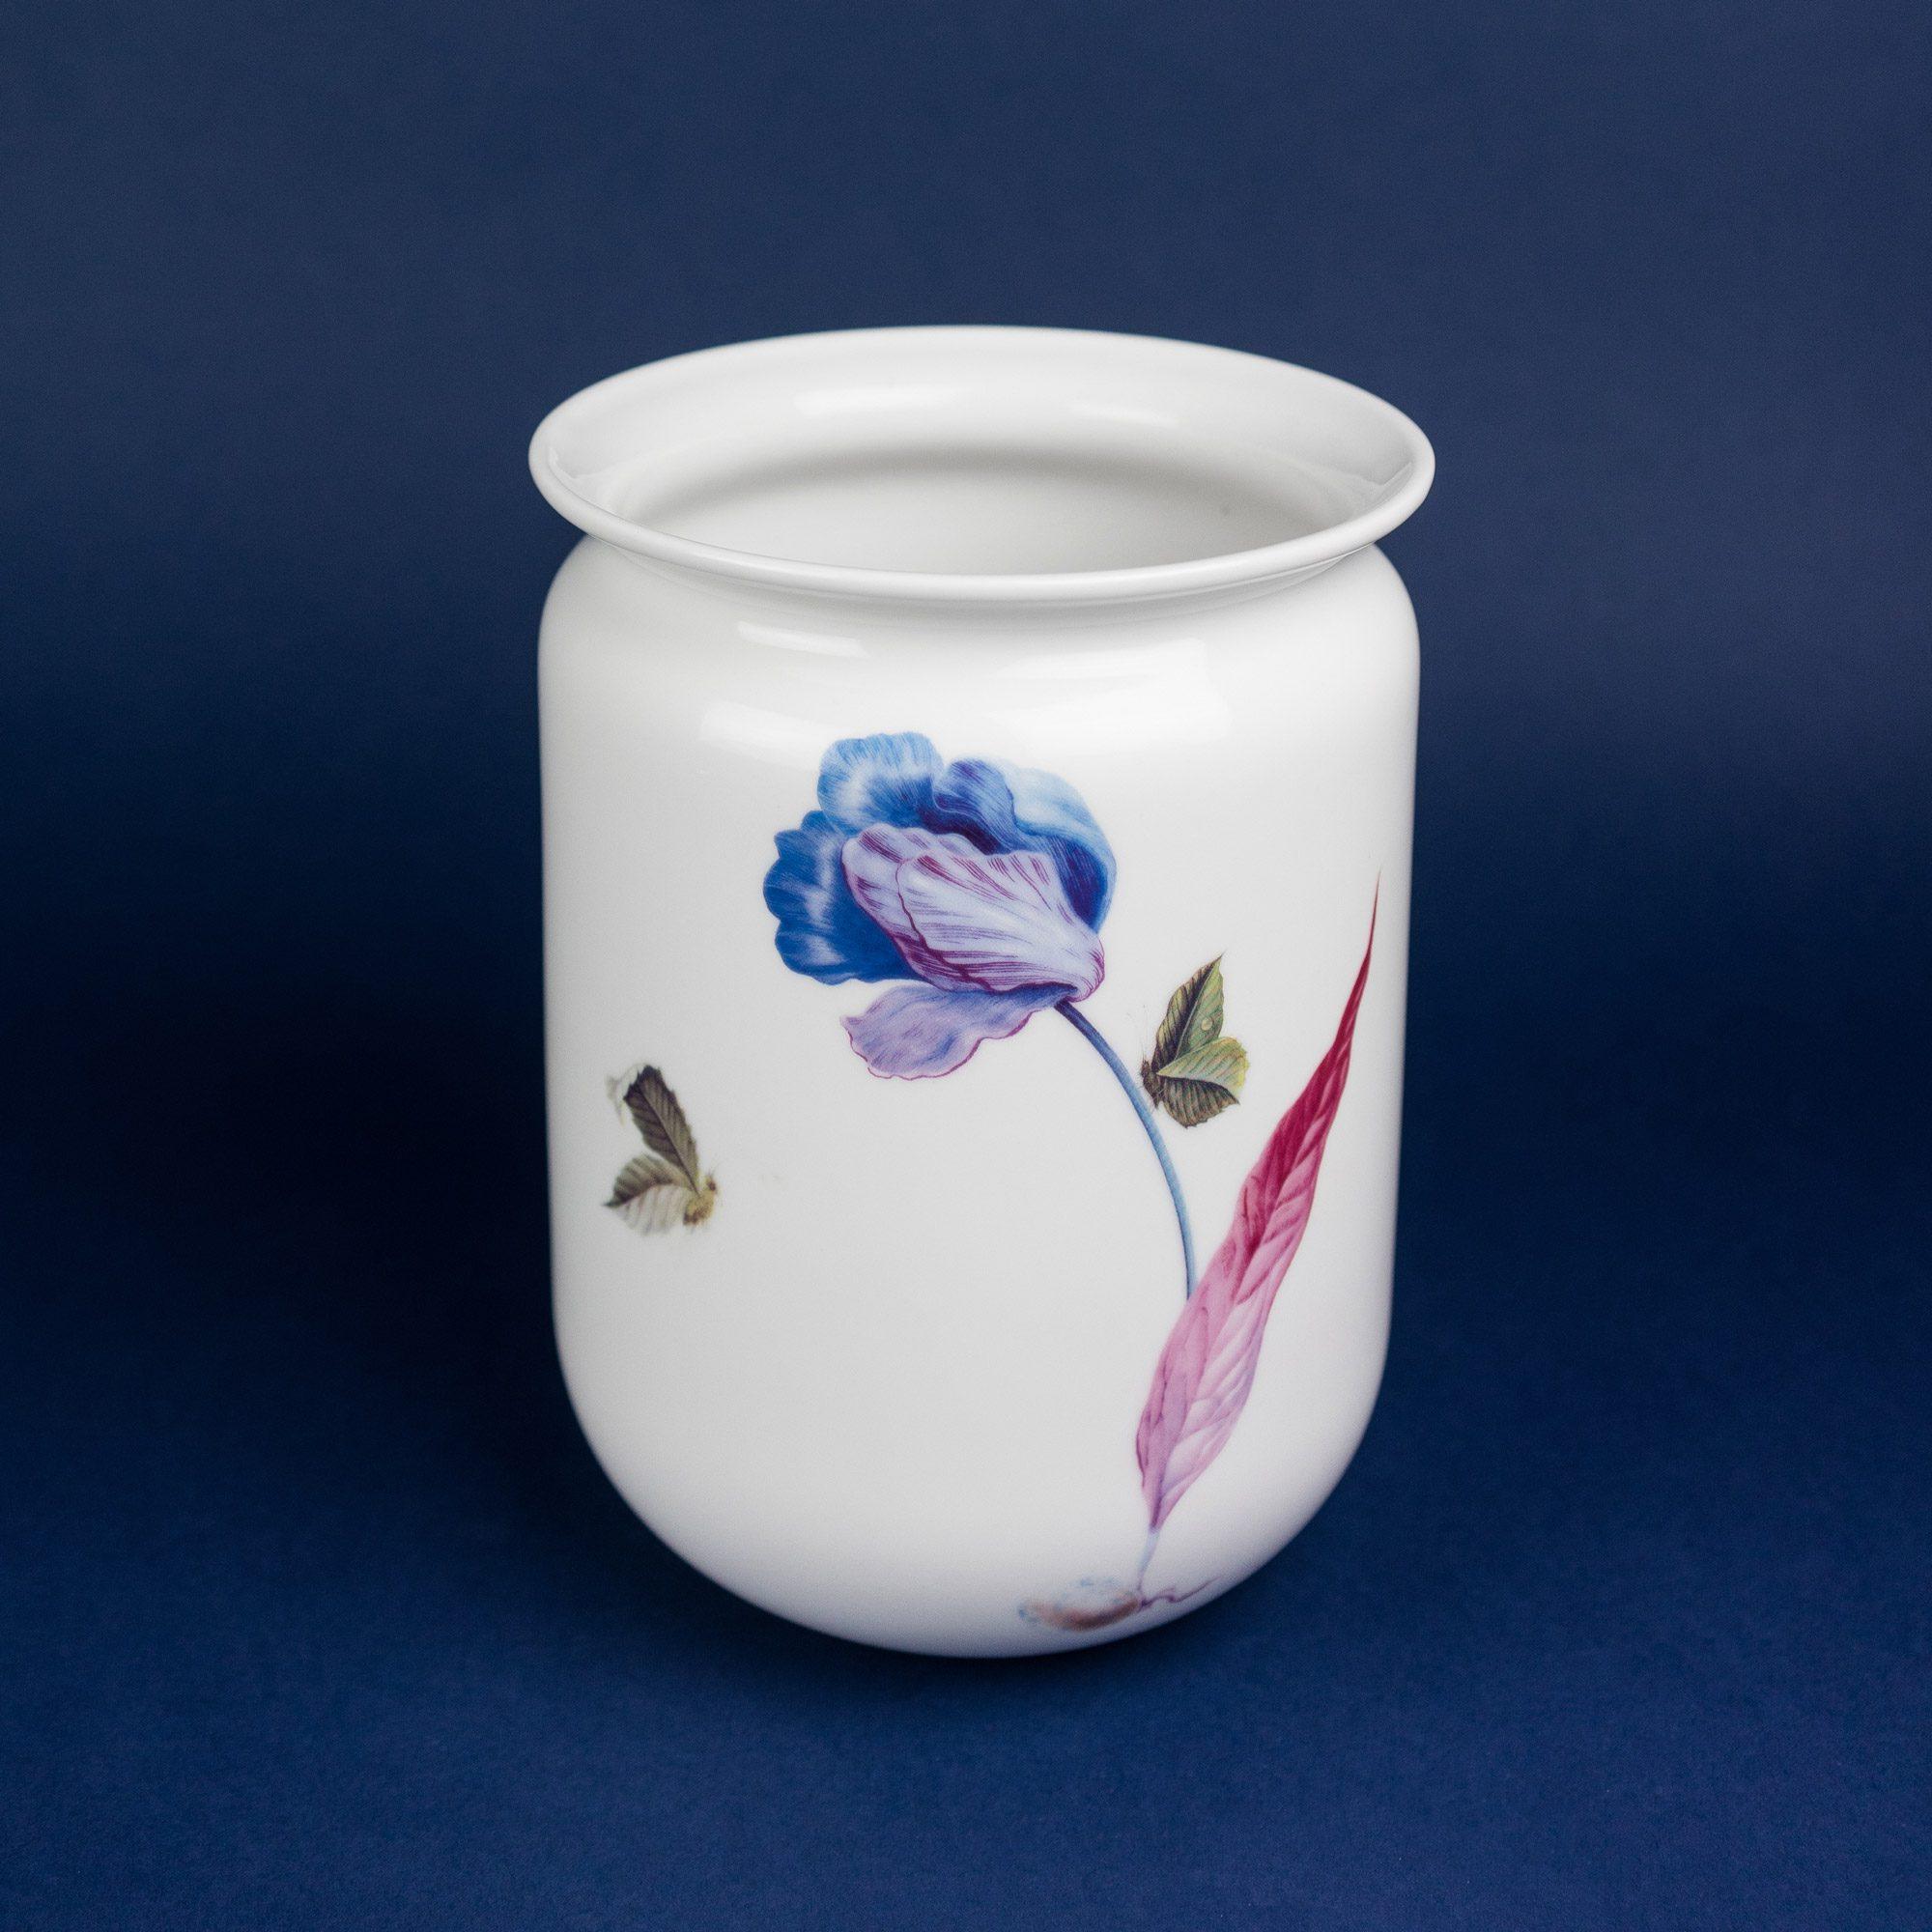 Tulips vase by Michal Bacak